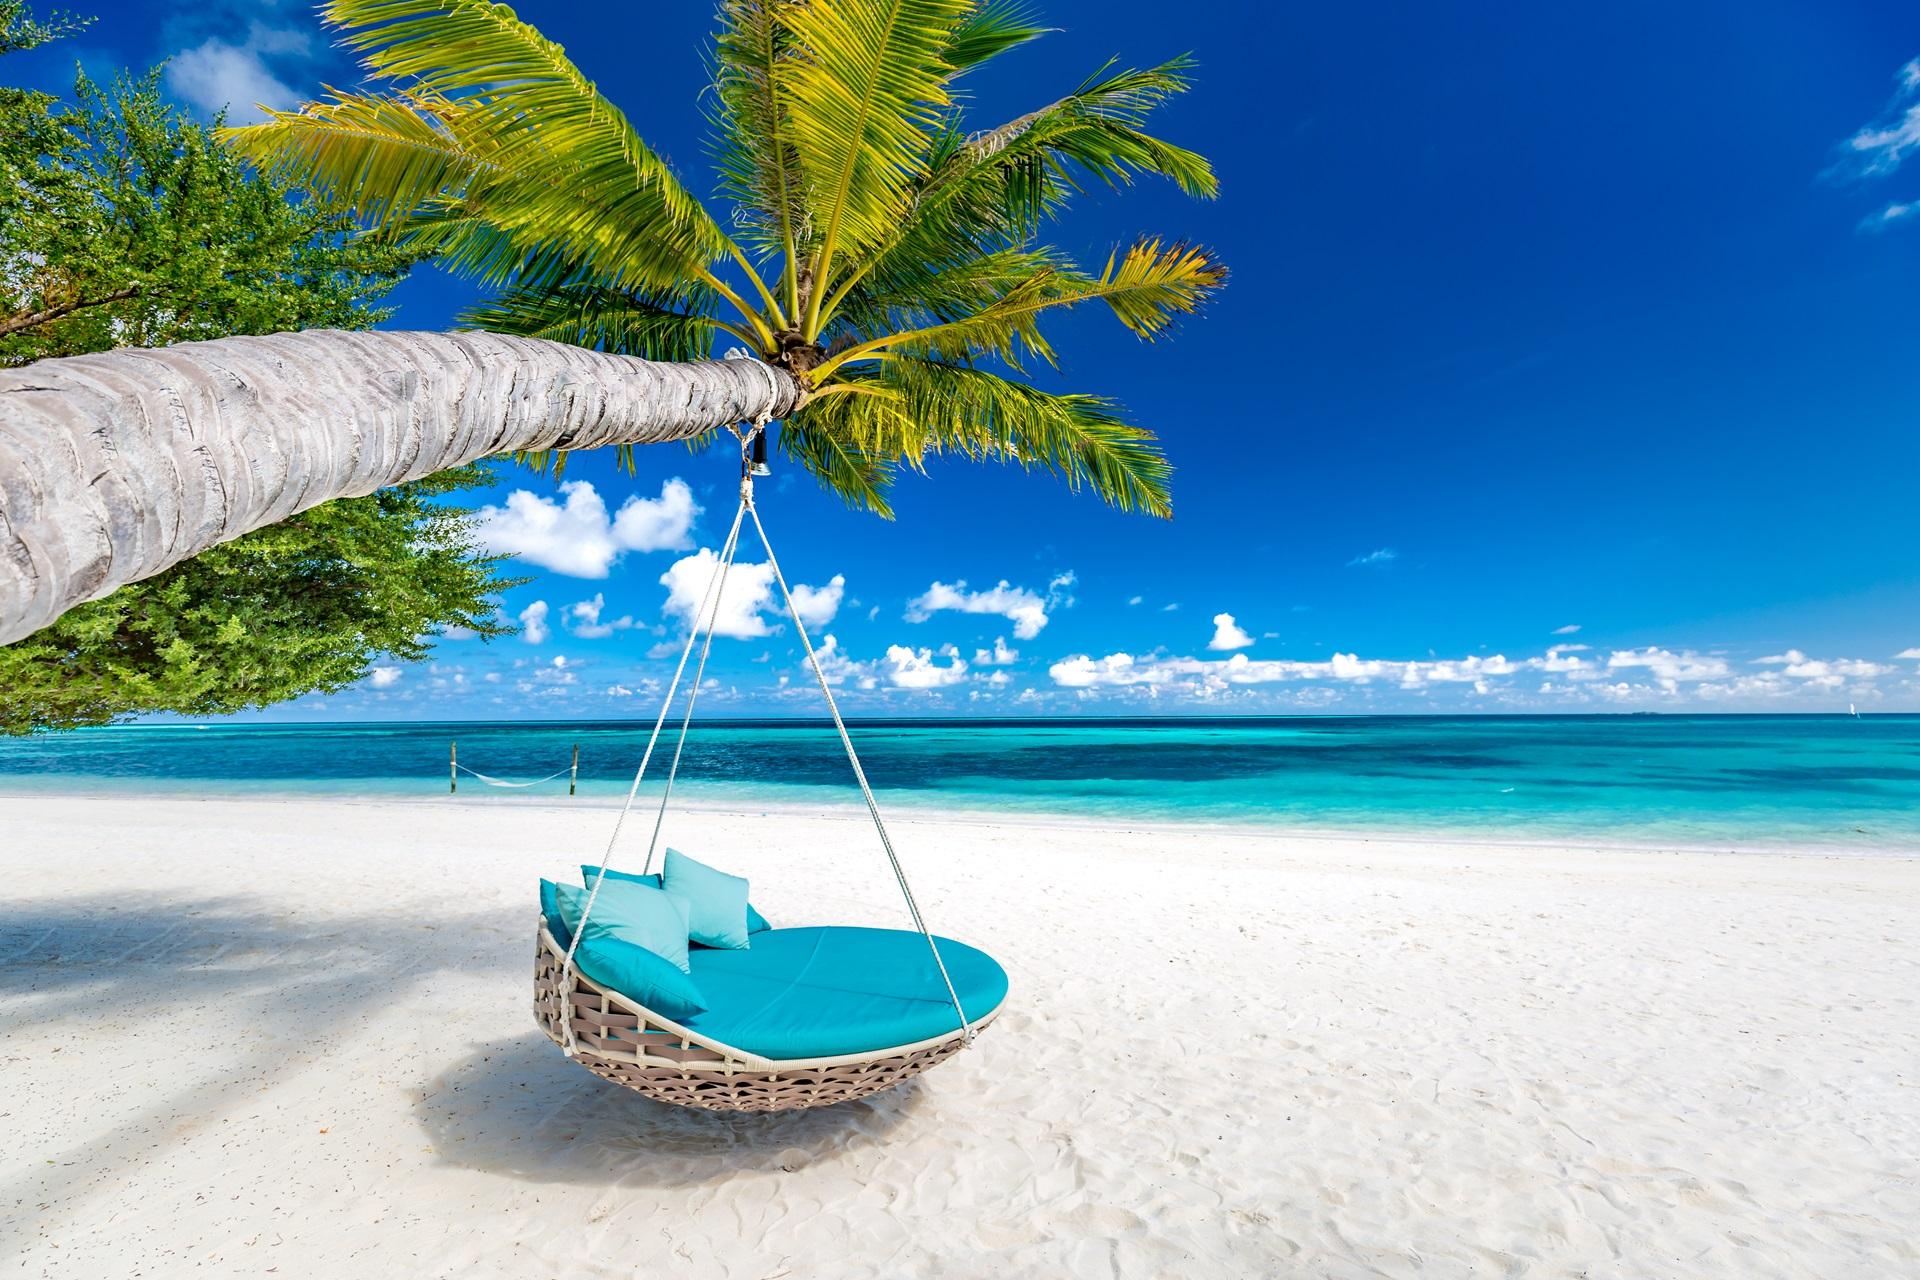 The magic of Maldives